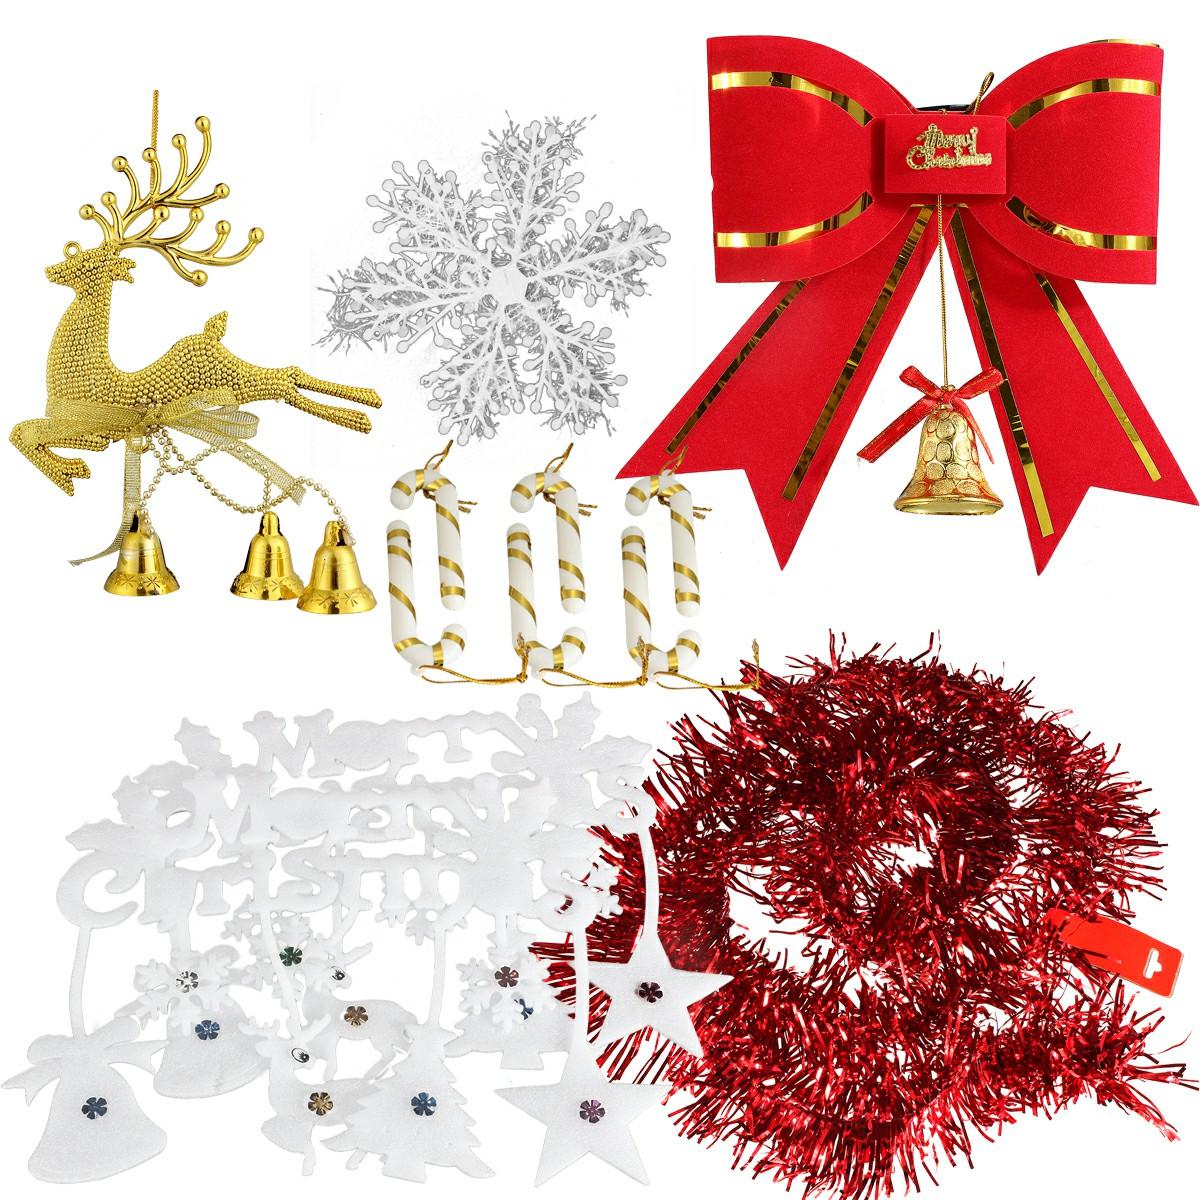 1 Set Christmas Xmas Bowknot Ribbon Snowflake Walking Stick Deer Jingle Hanging Decor Kit - Combination 1